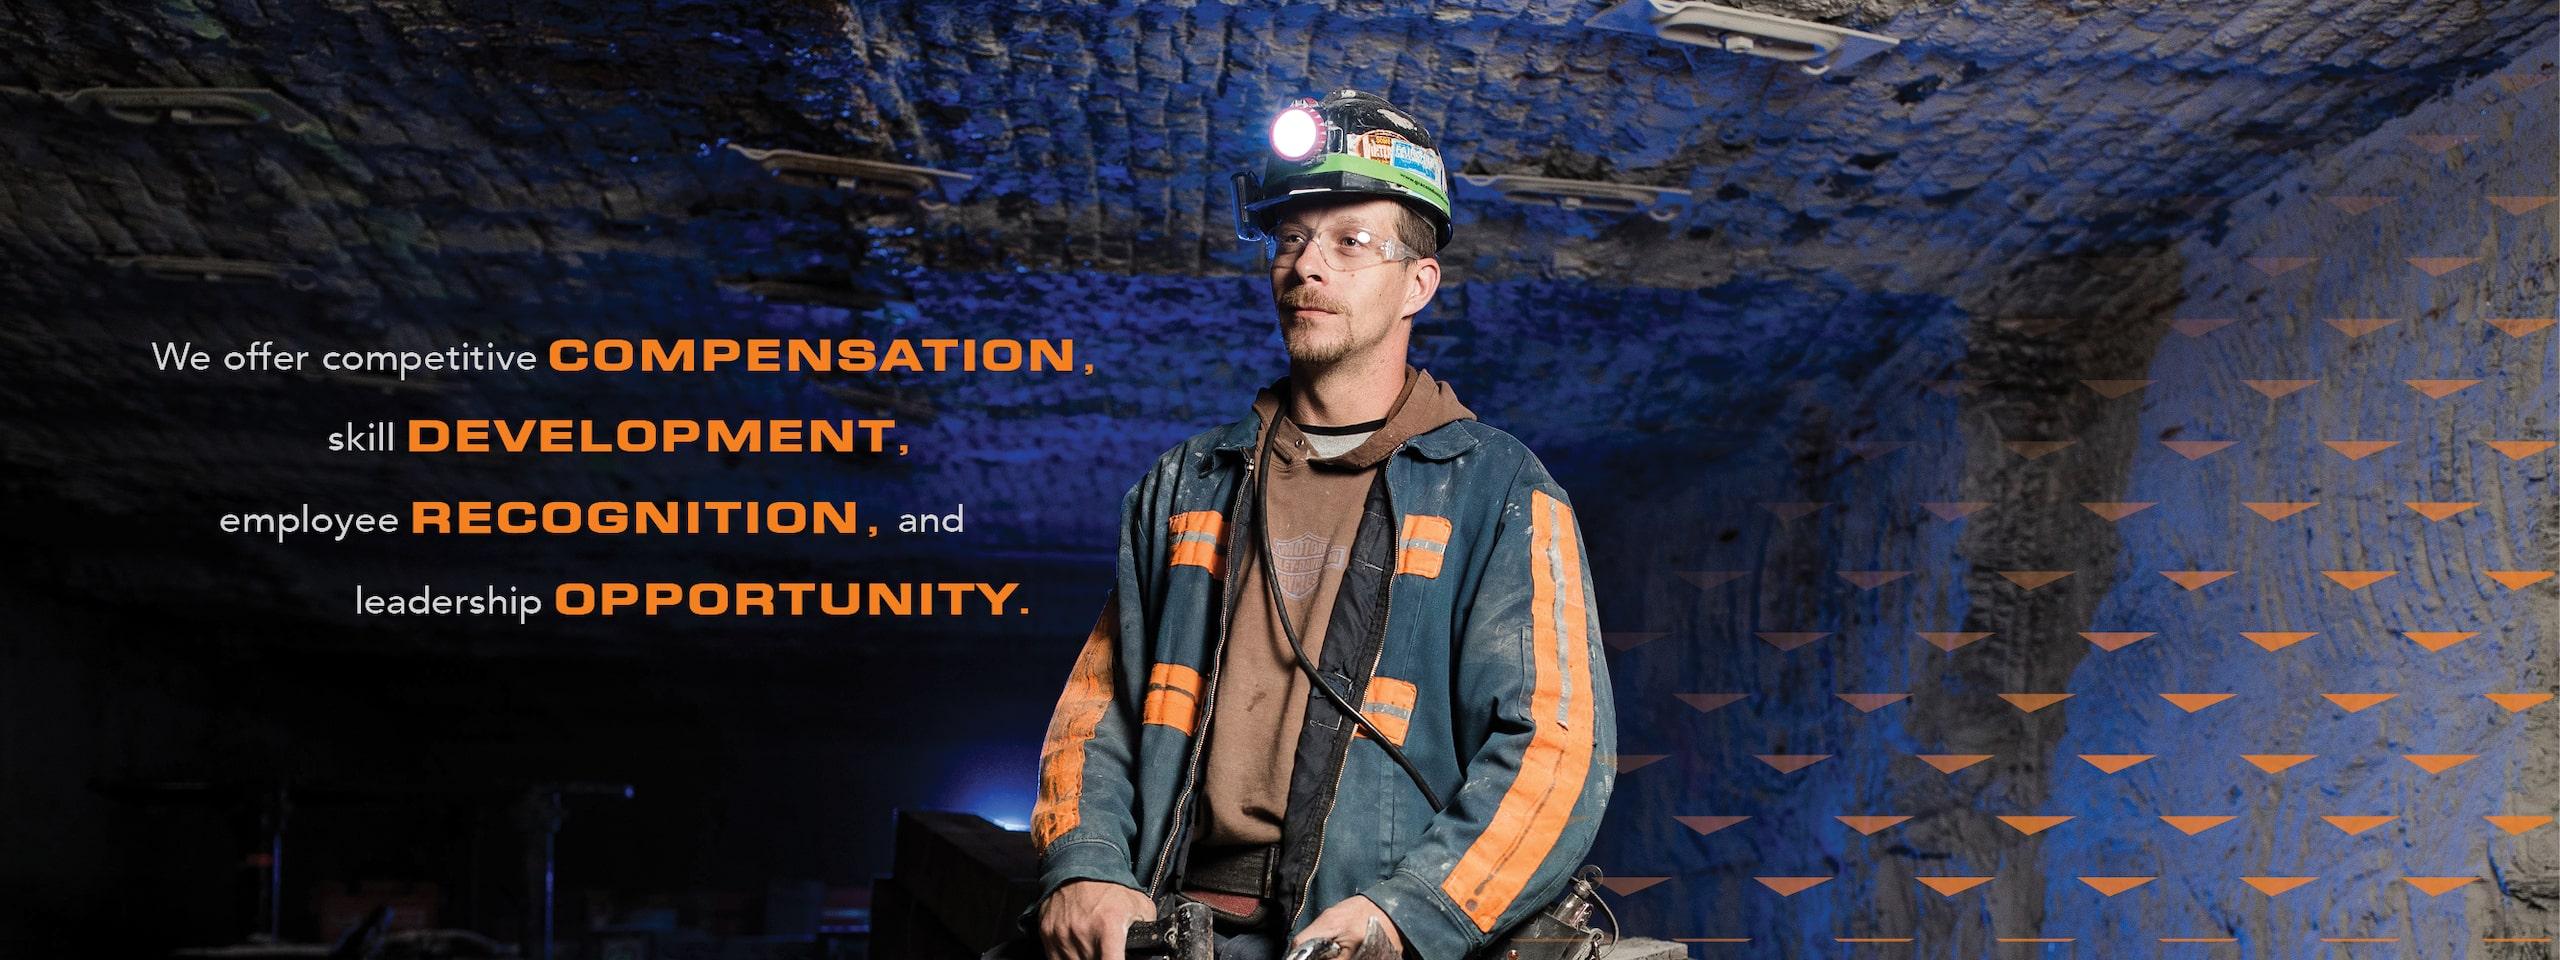 Blackhawk Mining LLC Employment Opportunities